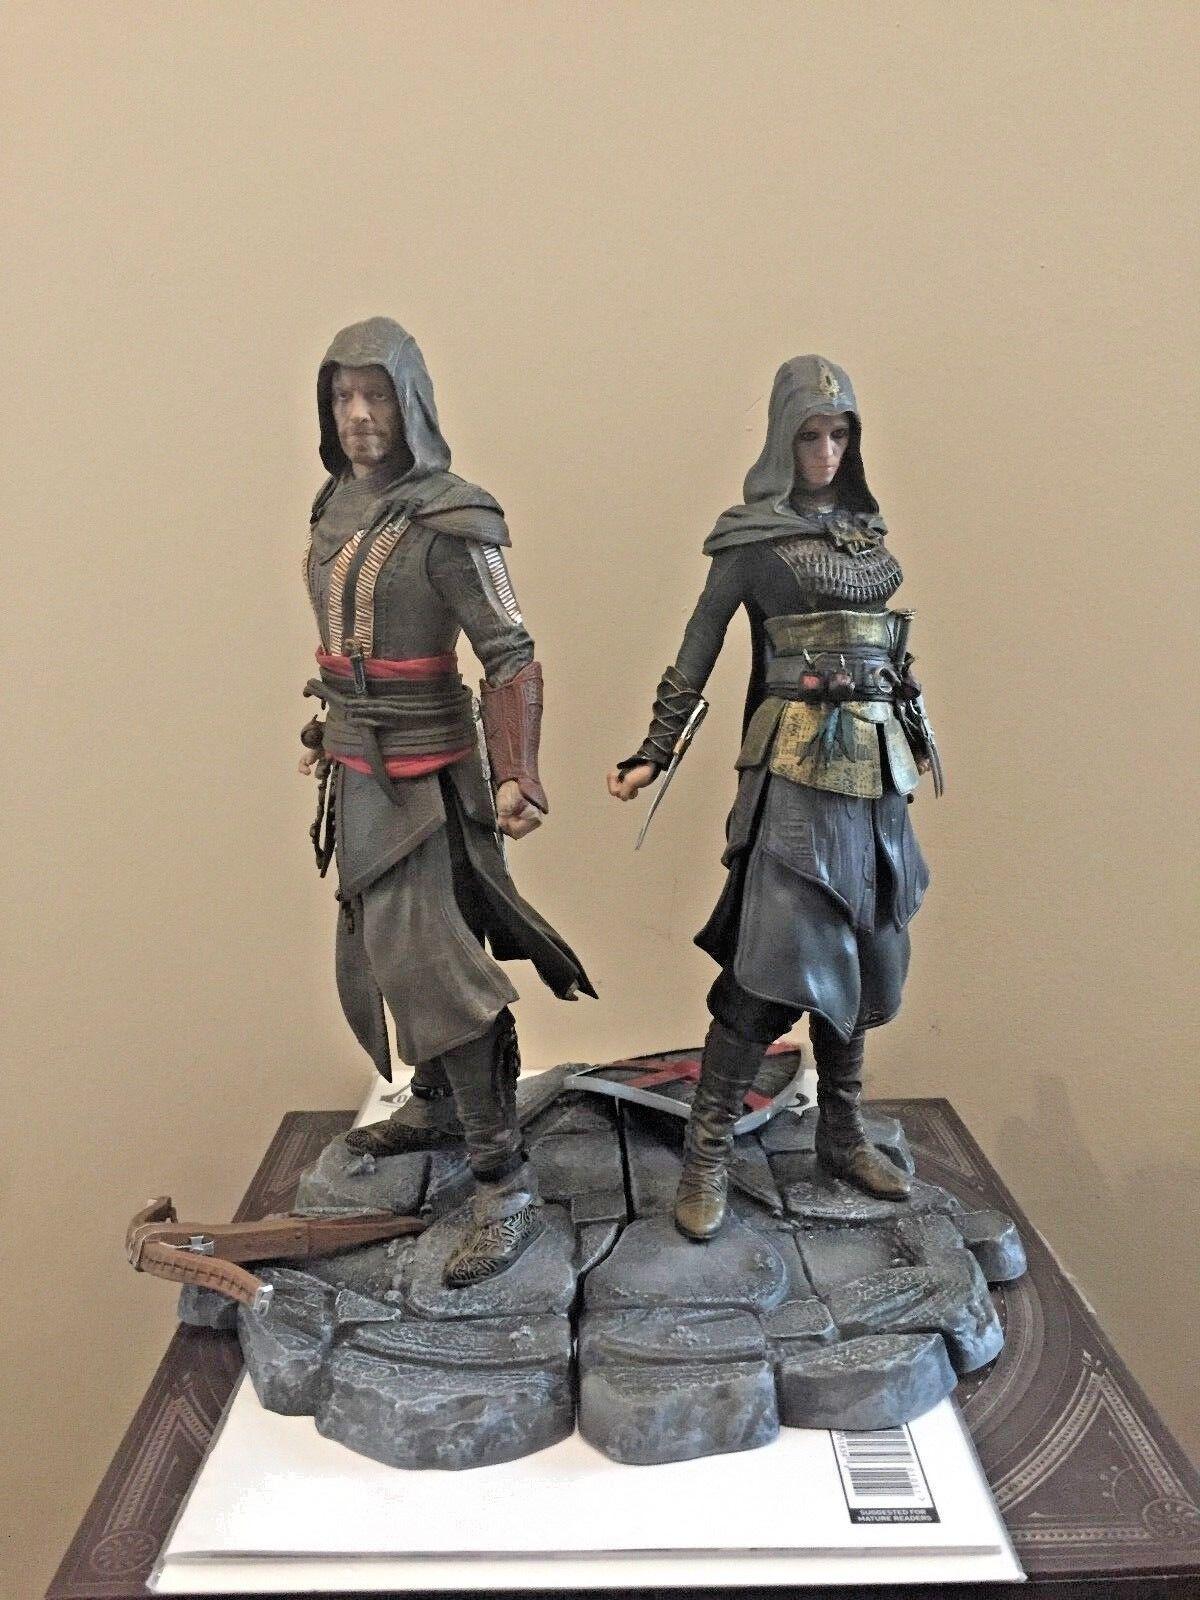 Assassin 's creed aguilar und maria - statue ubisoft abbildung